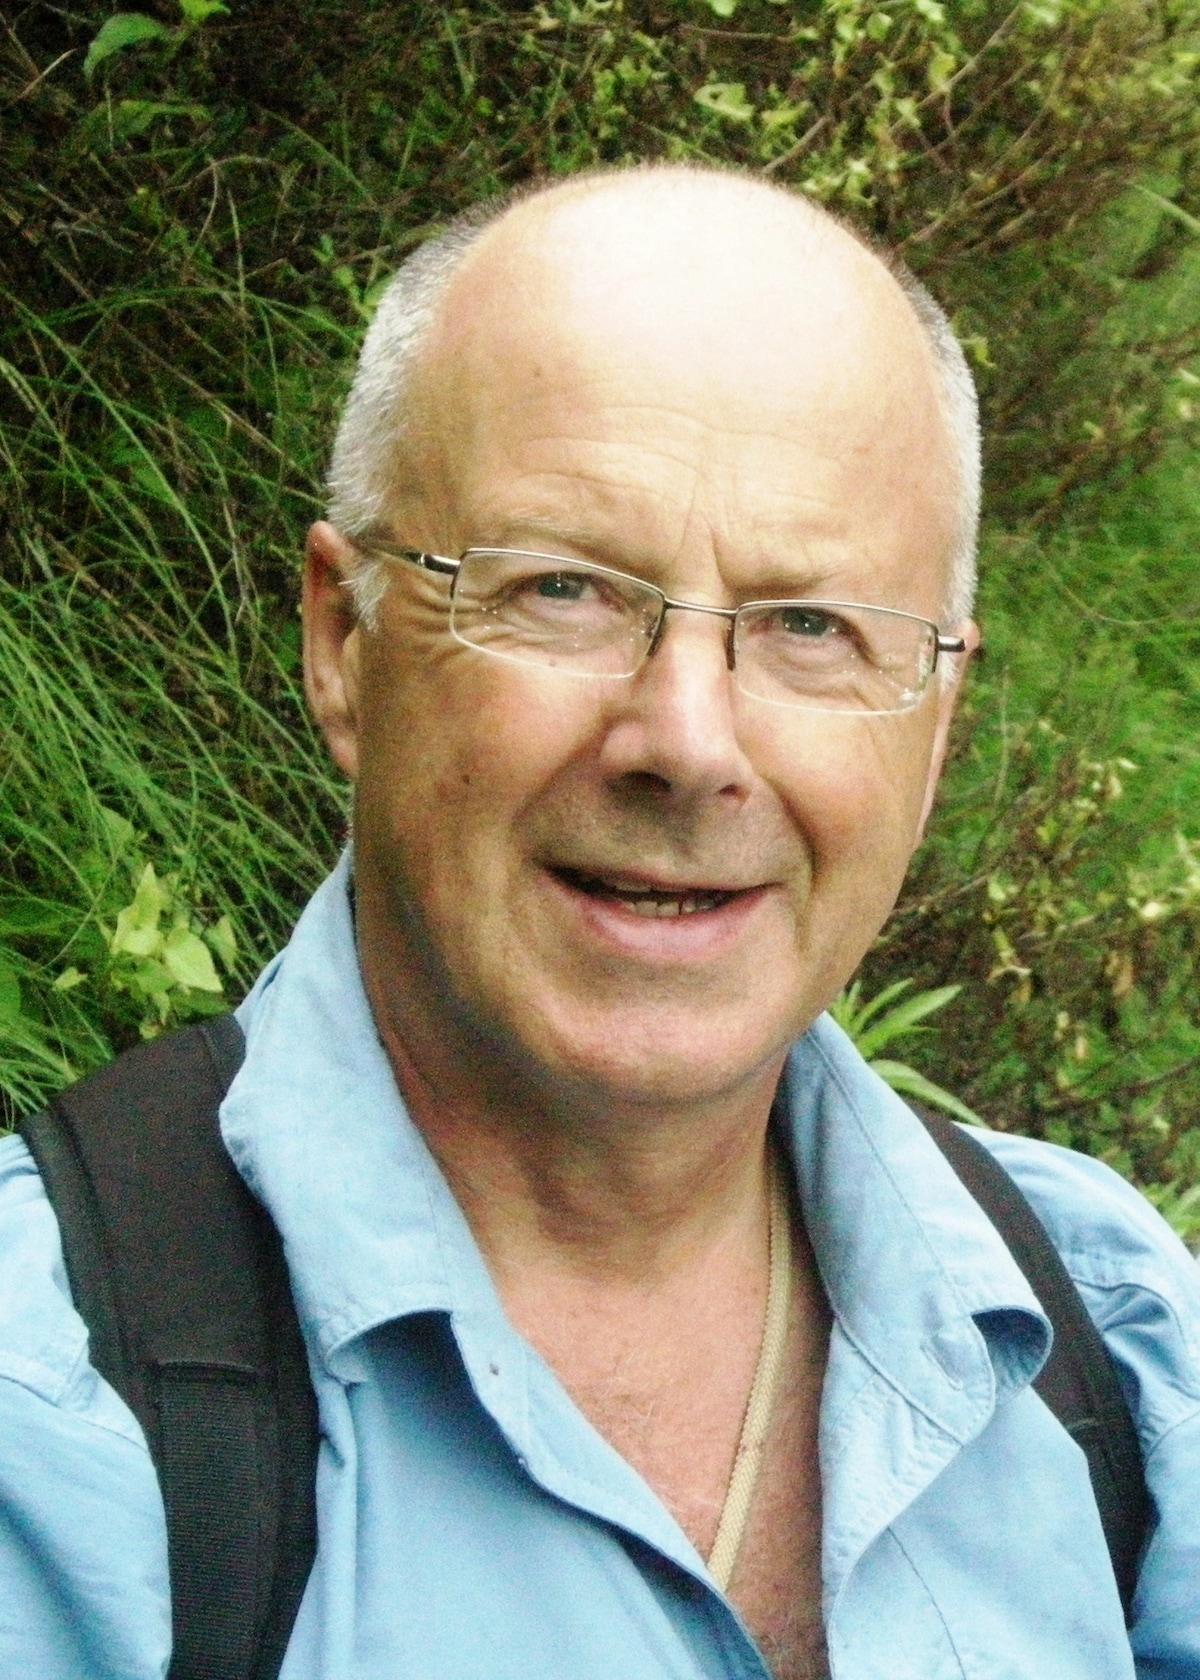 Alan from Bath